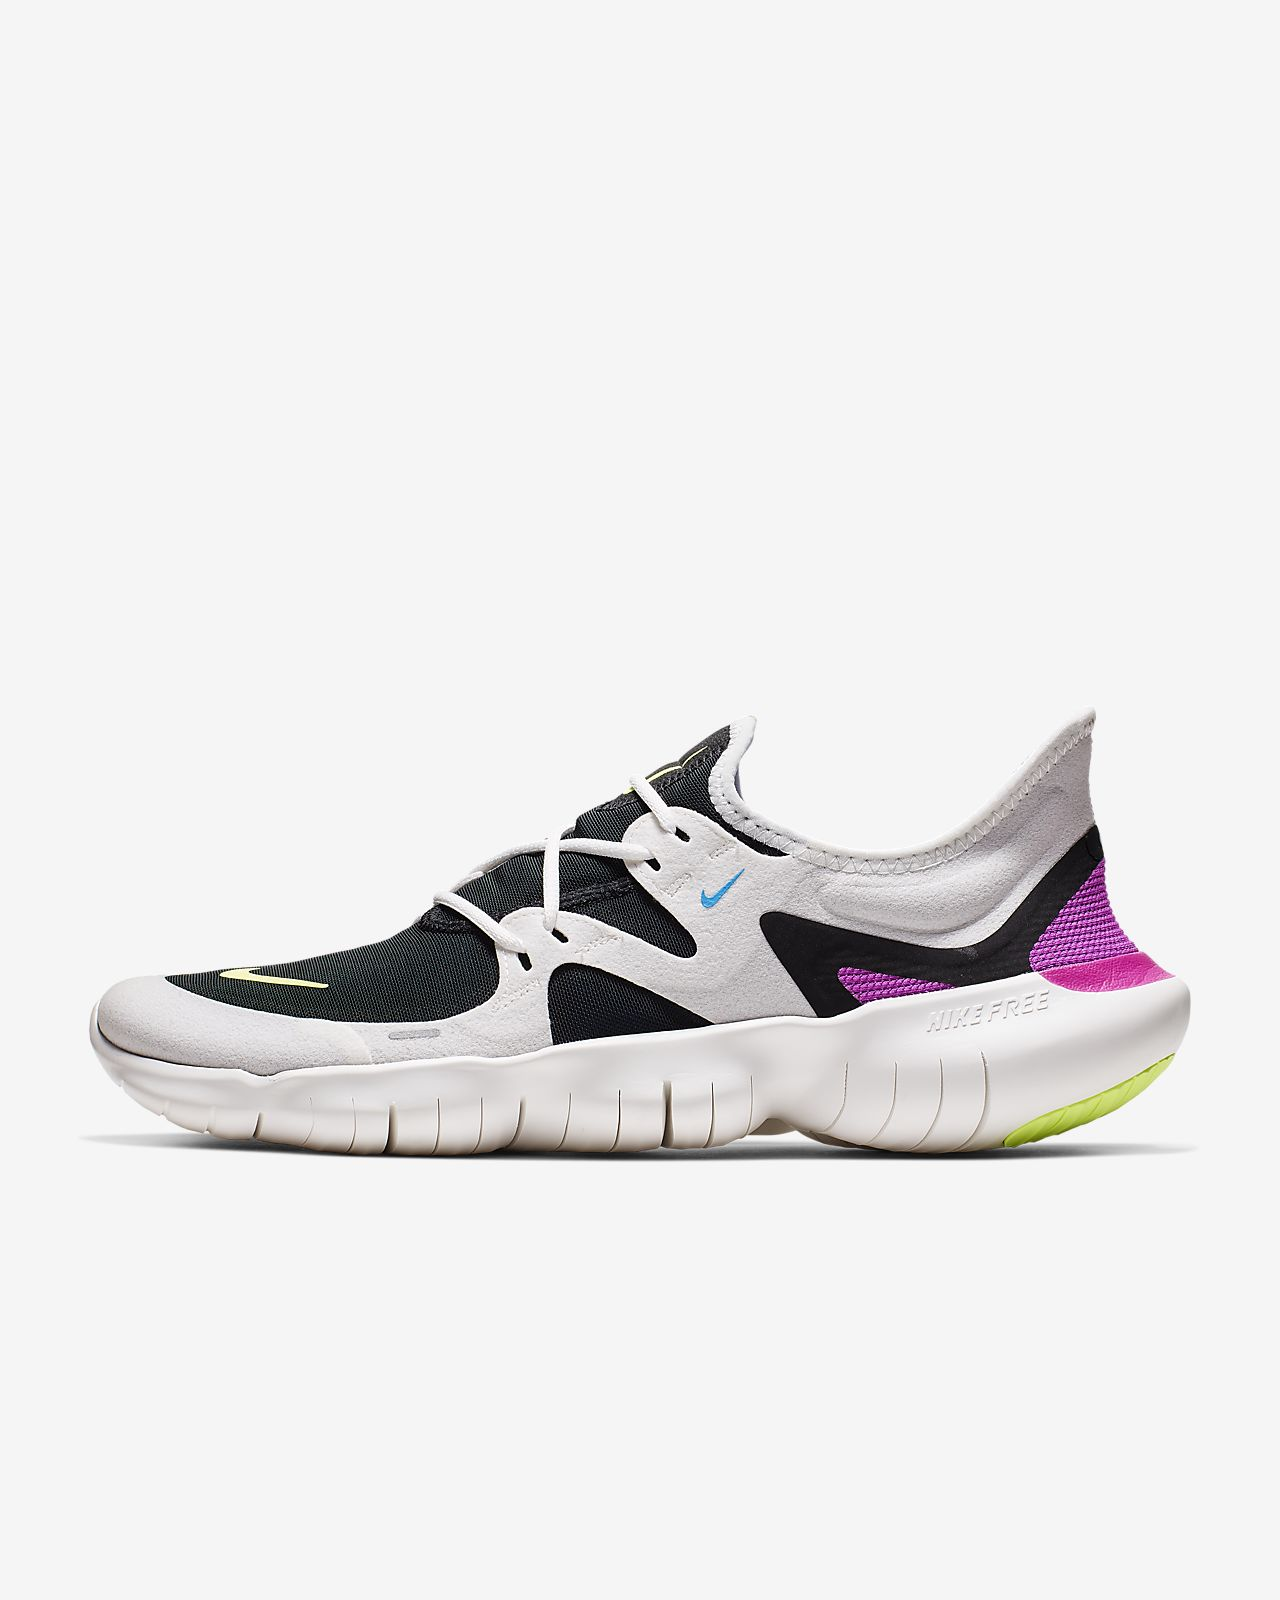 sneakers for cheap d0ef2 93d6e ... Löparsko Nike Free RN 5.0 för män